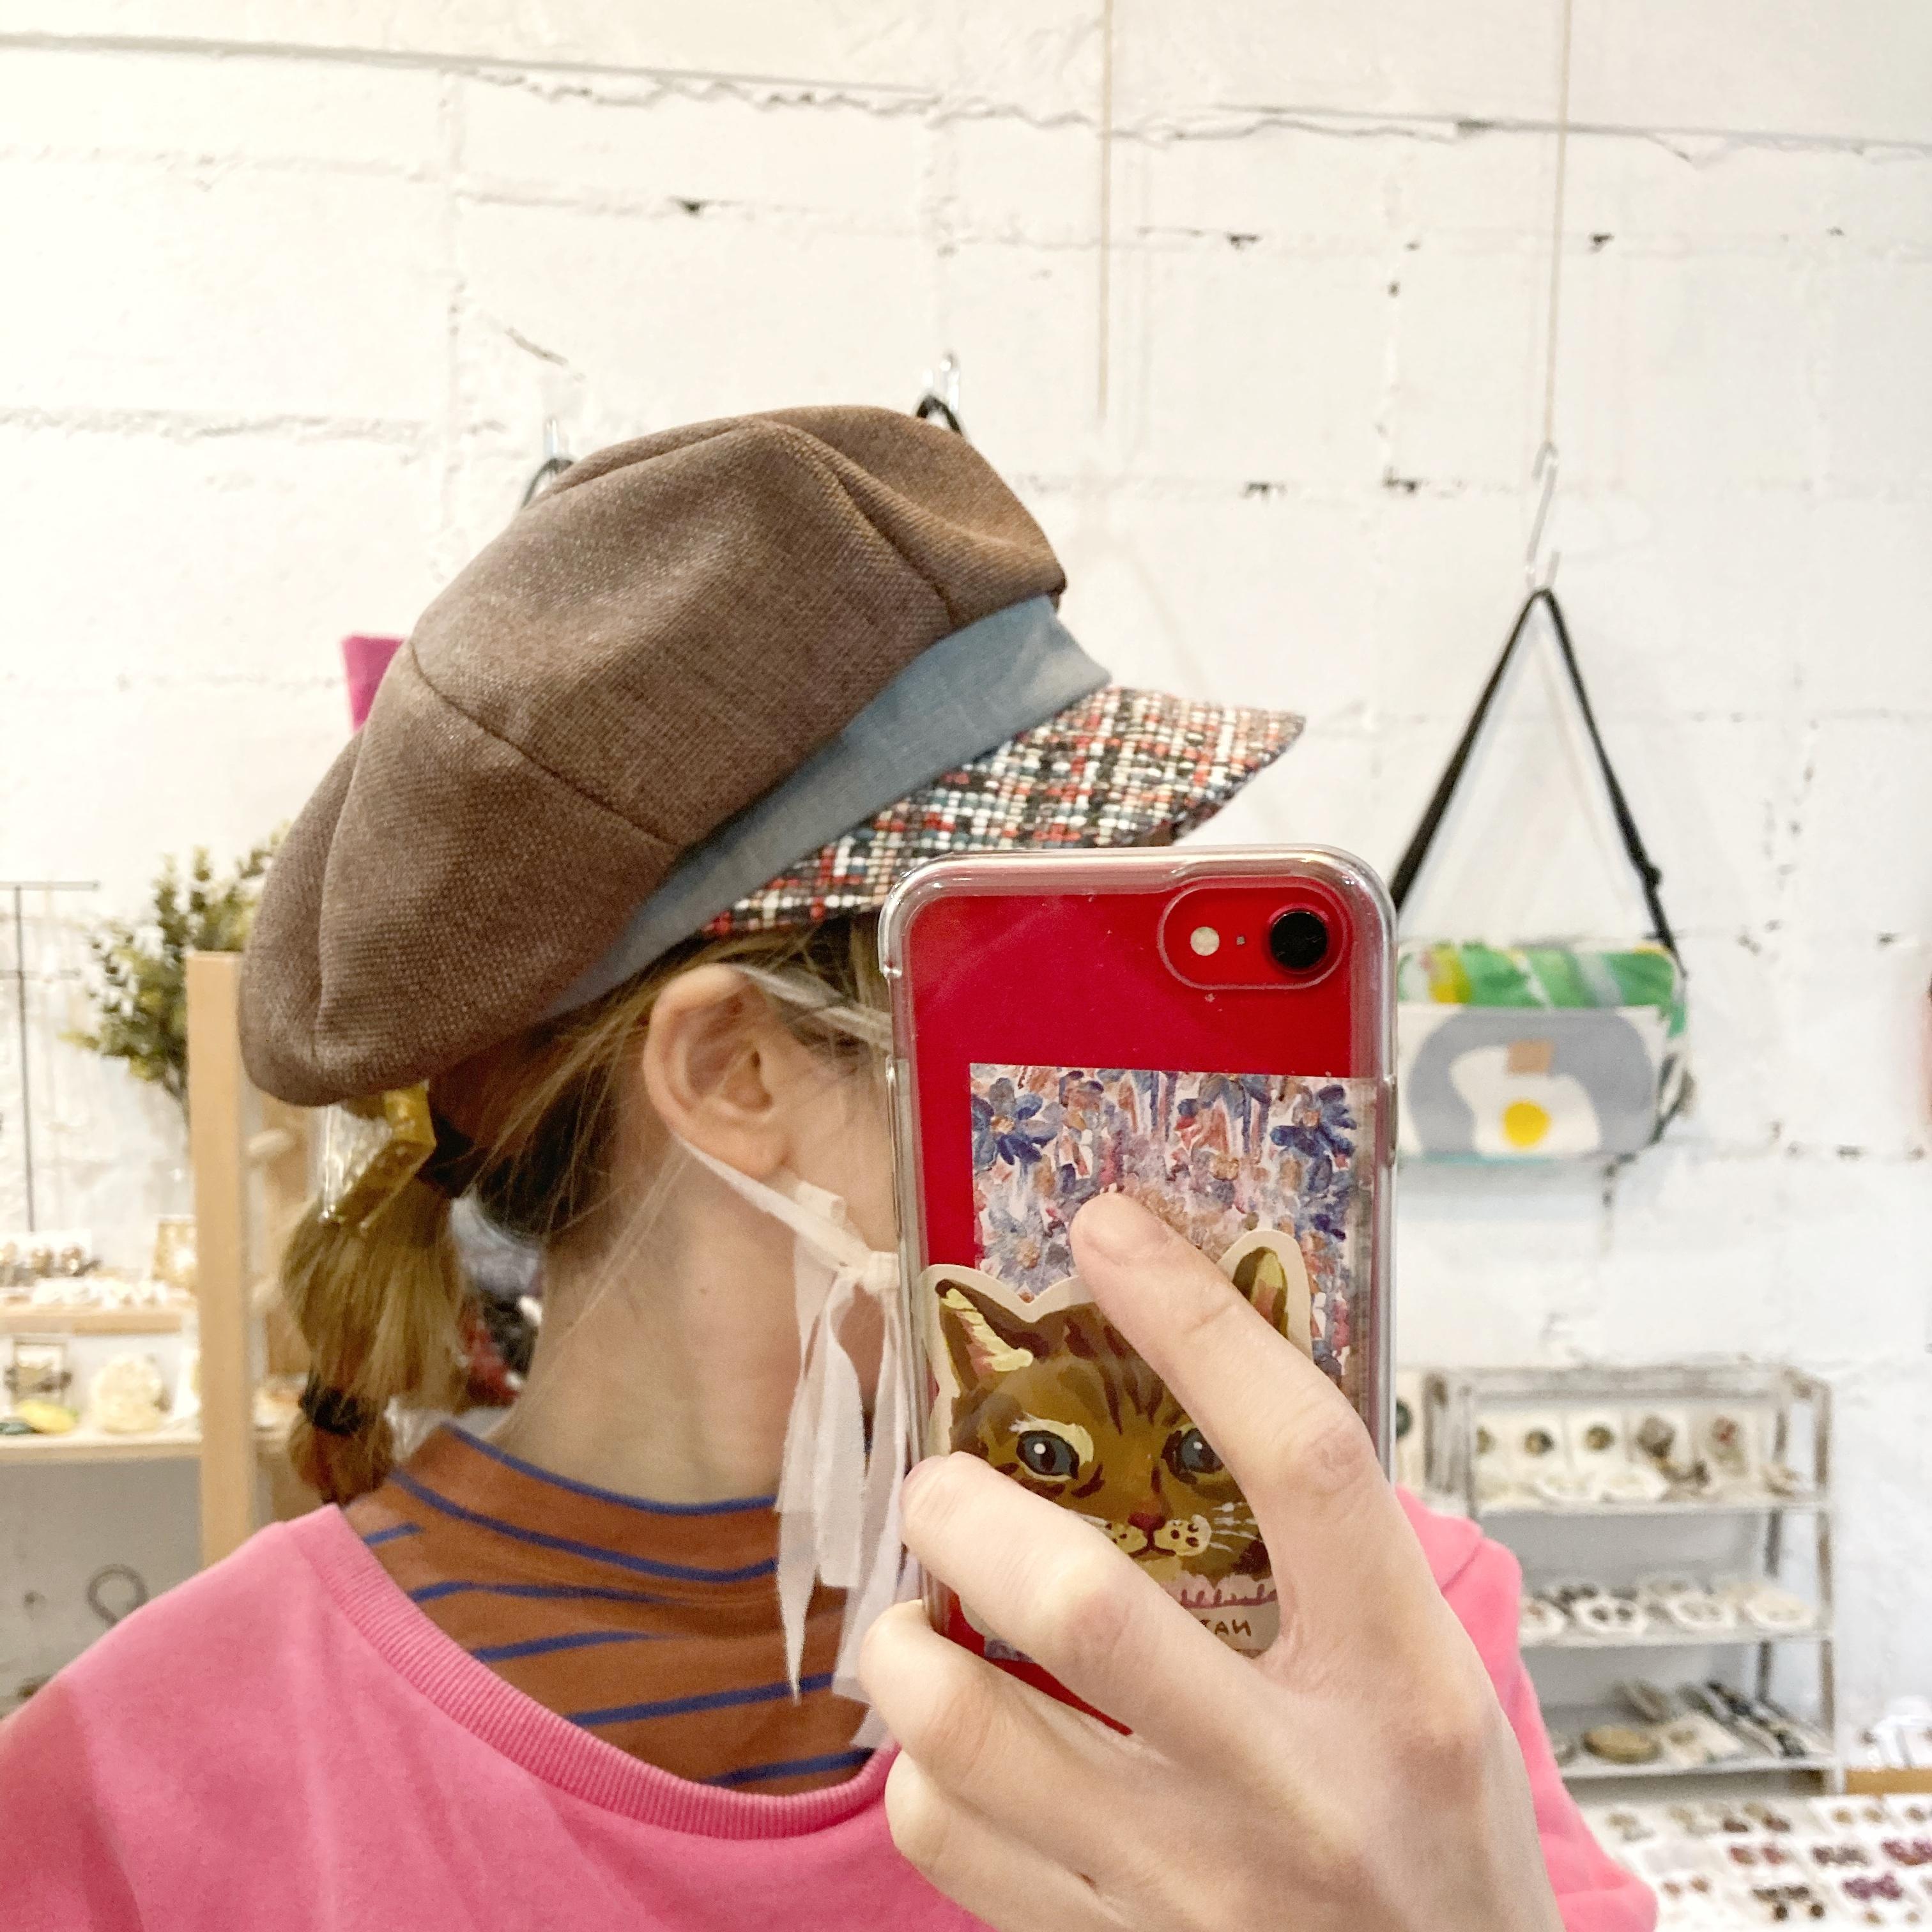 【LuLu de chapeau】キャスケット(ブラウン)